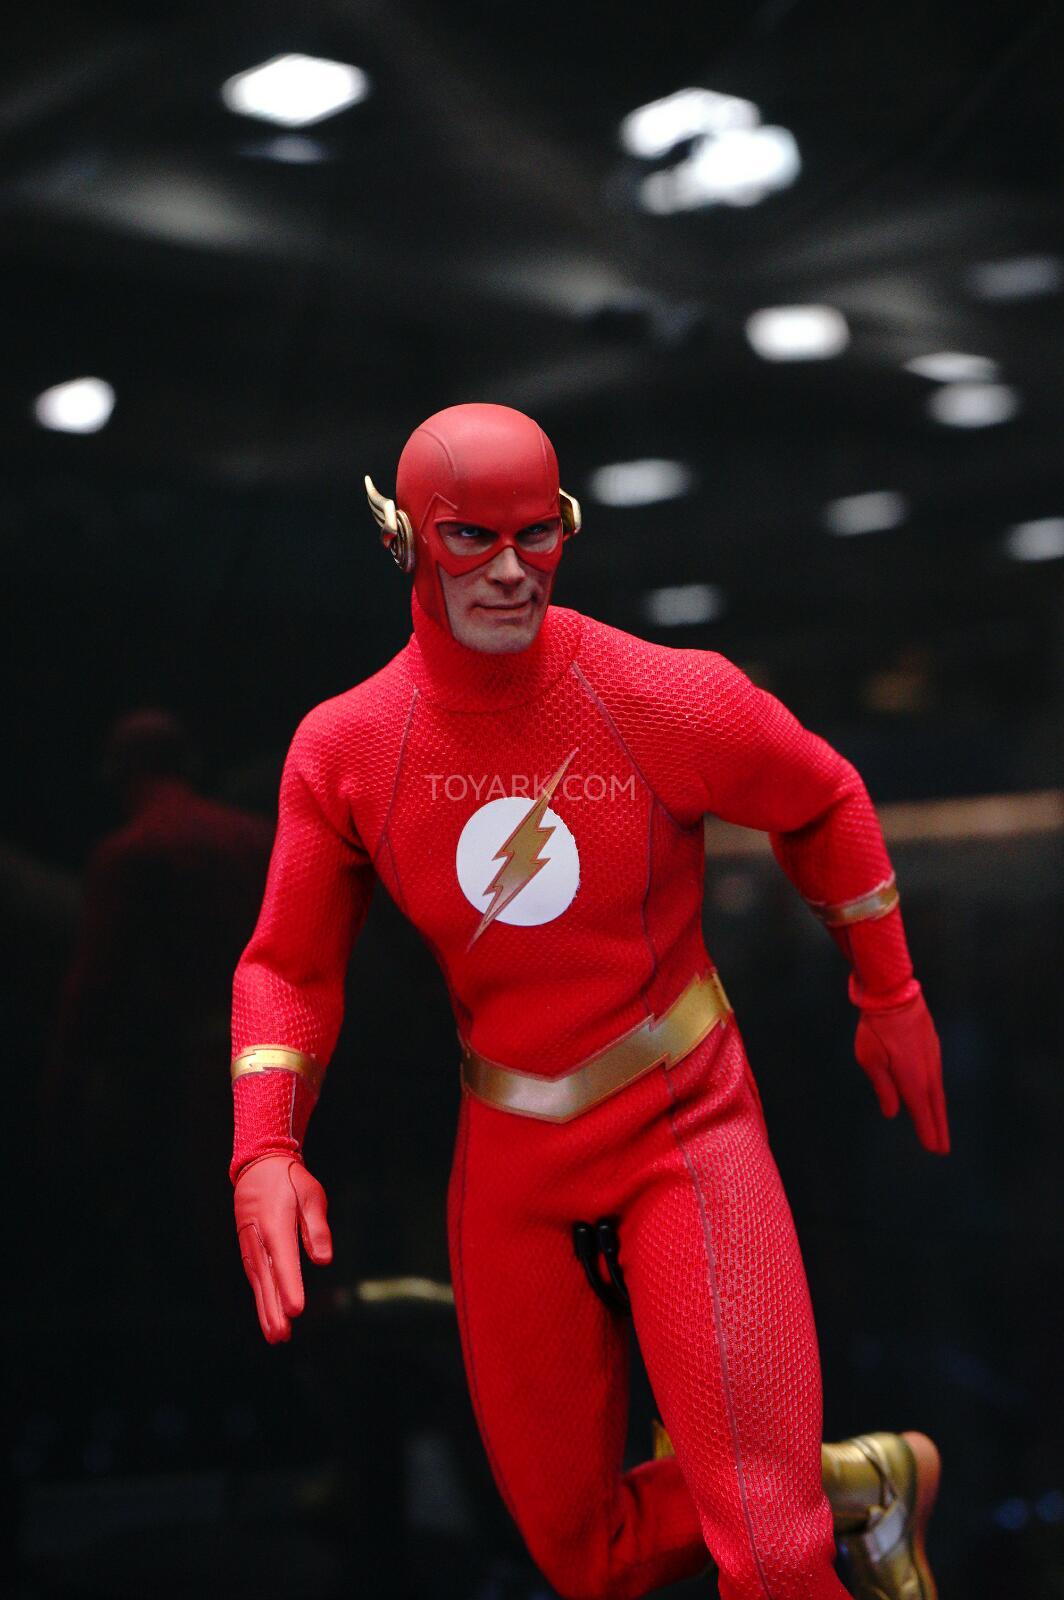 [Sideshow] DC Comics: Flash Sixth Scale Figure - Página 2 DSC07536